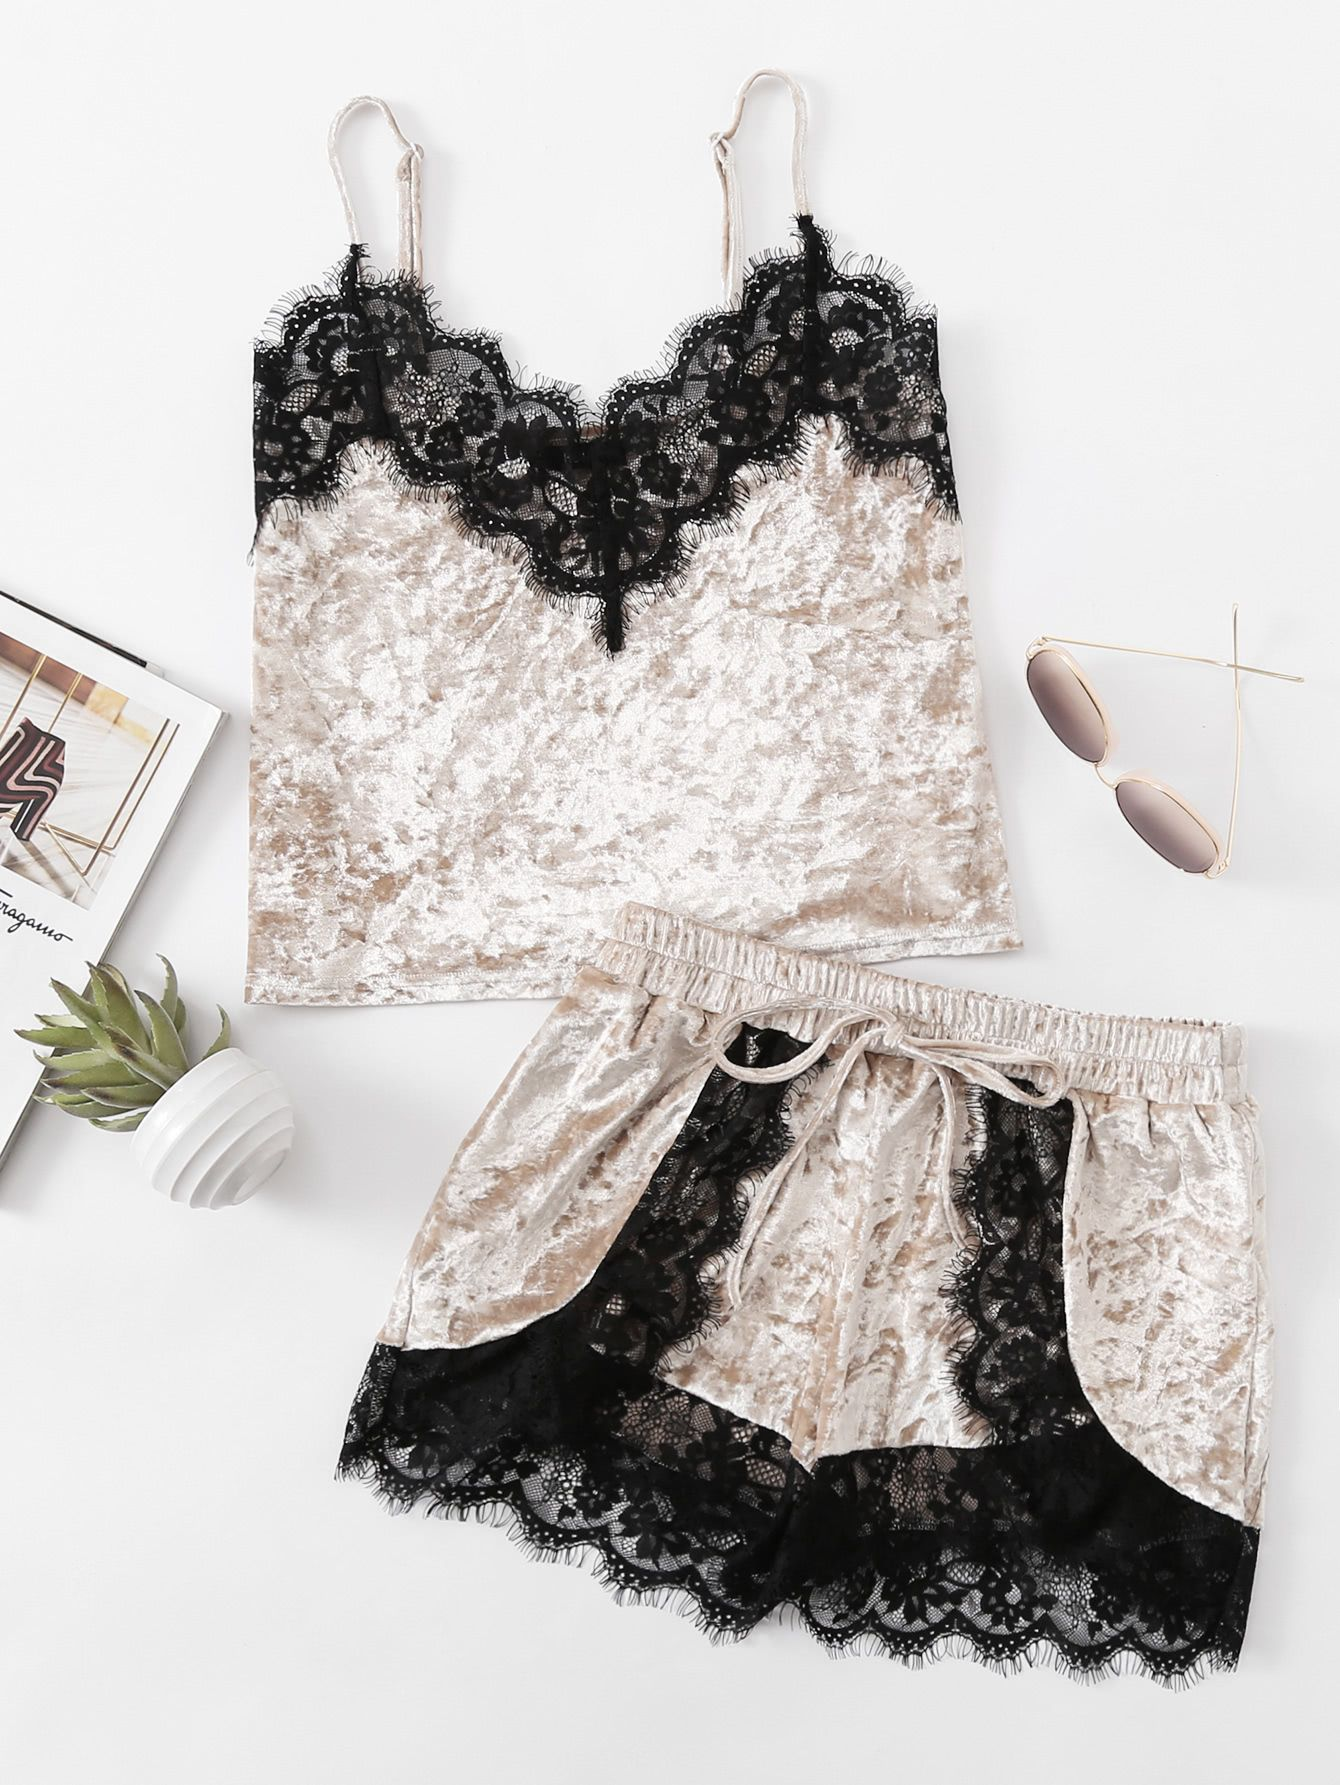 Lace dress nightwear  Eyelash Lace Trim Velvet Cami u Shorts Pajama Set  Наряды